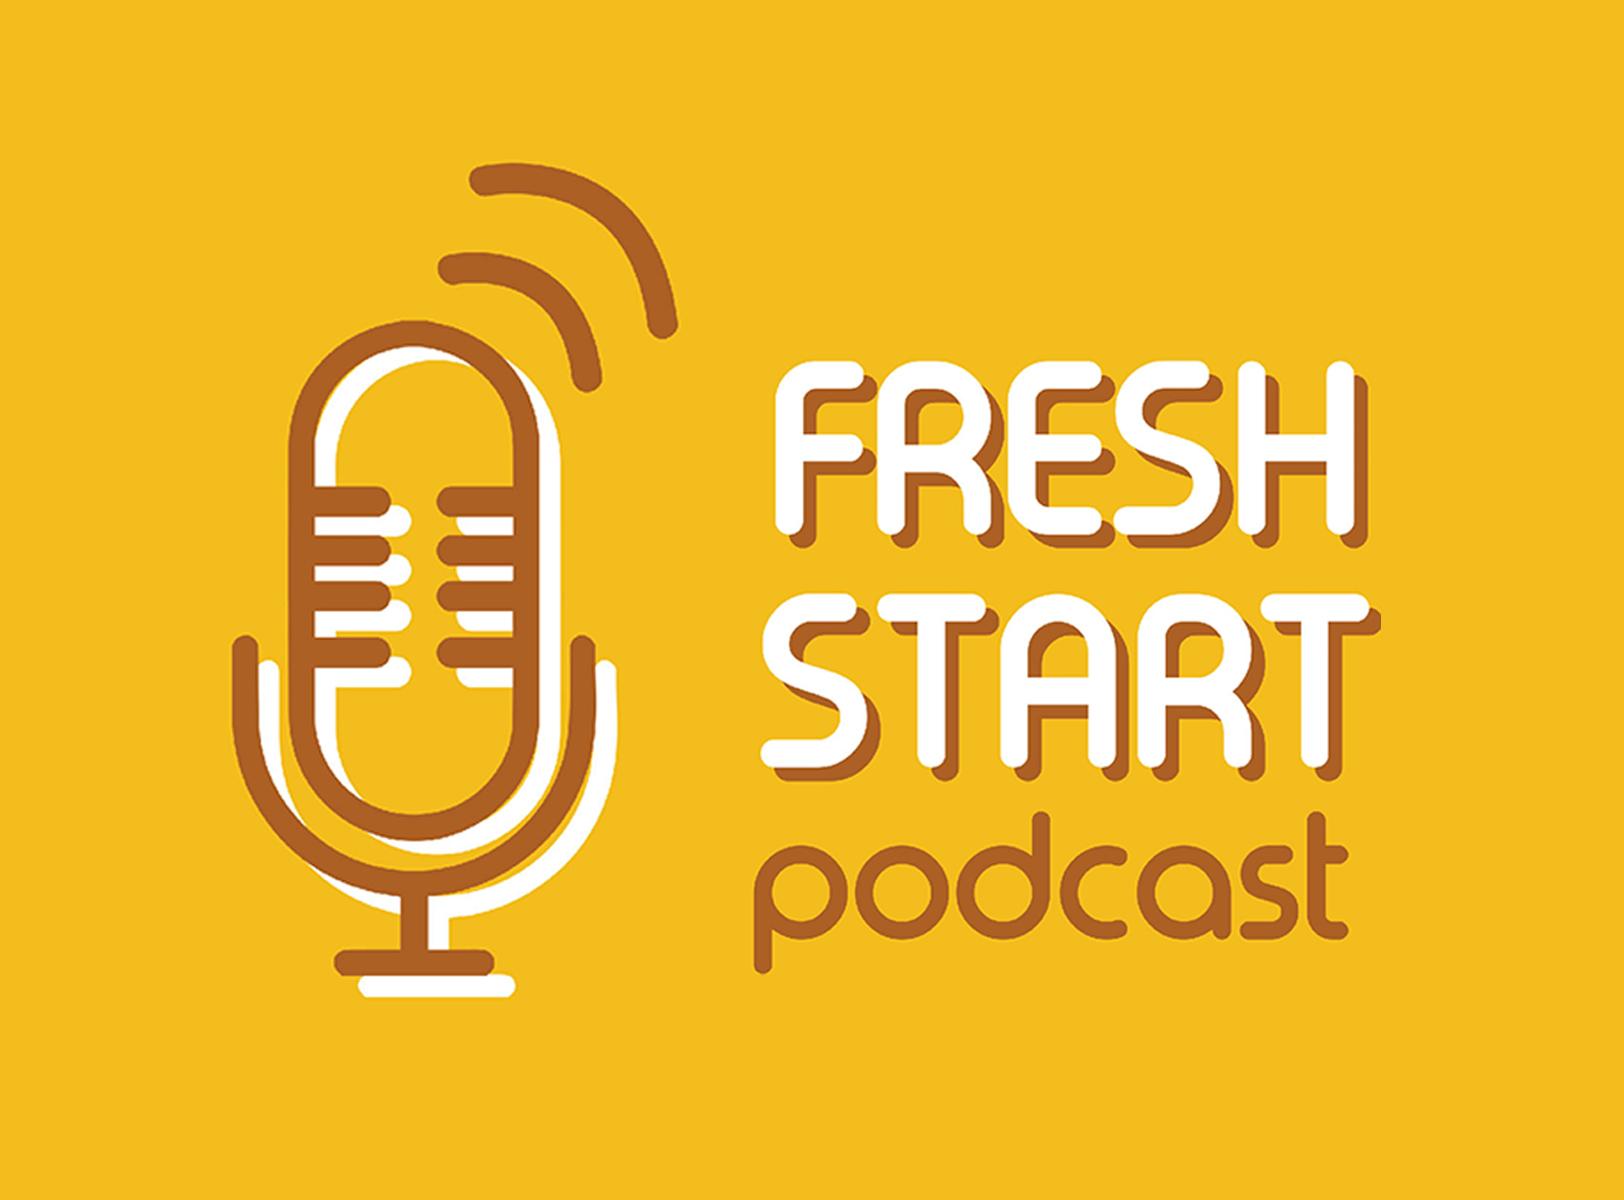 Fresh Start: Podcast News (5/3/2019 Fri.)